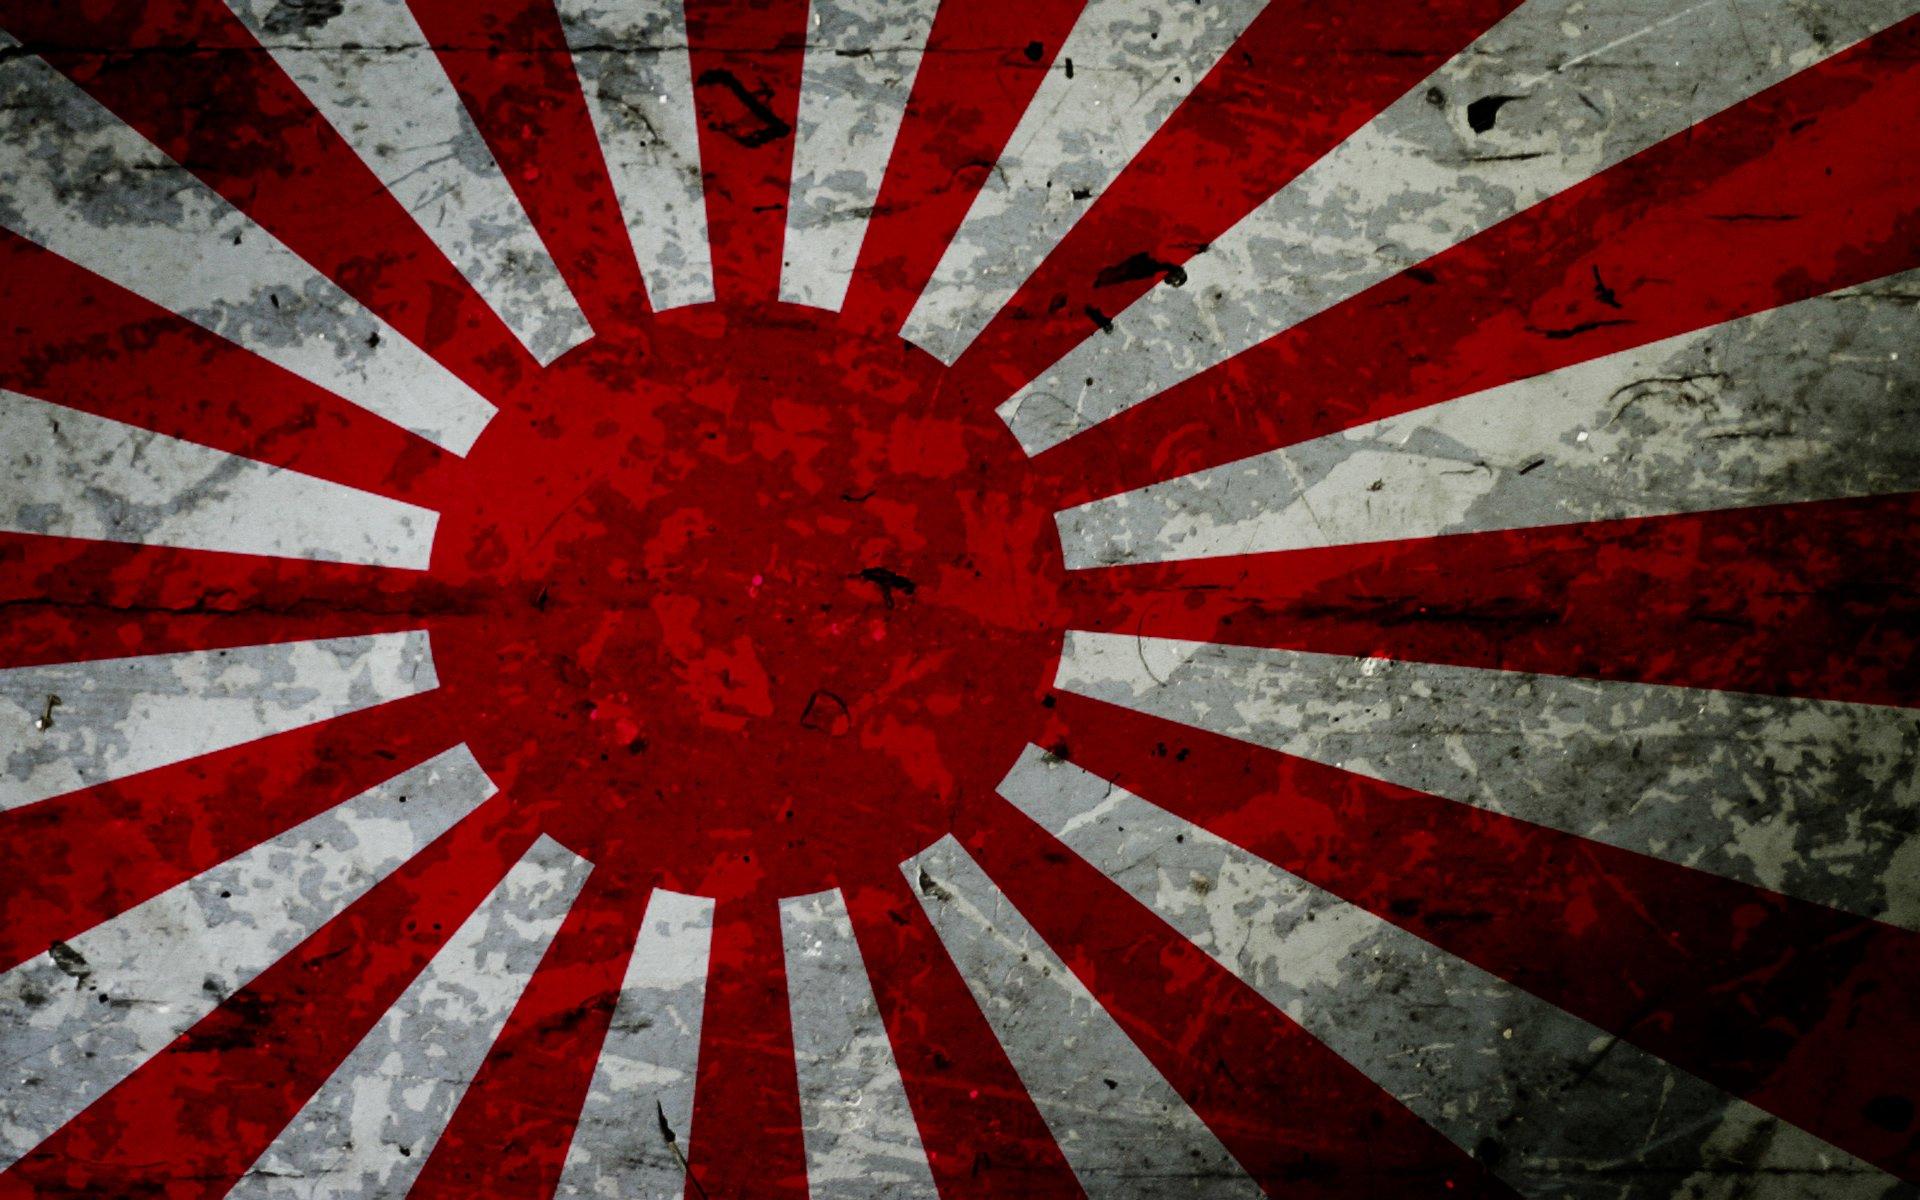 Hd wallpaper japan - Misc Flag Of Japan Wallpaper